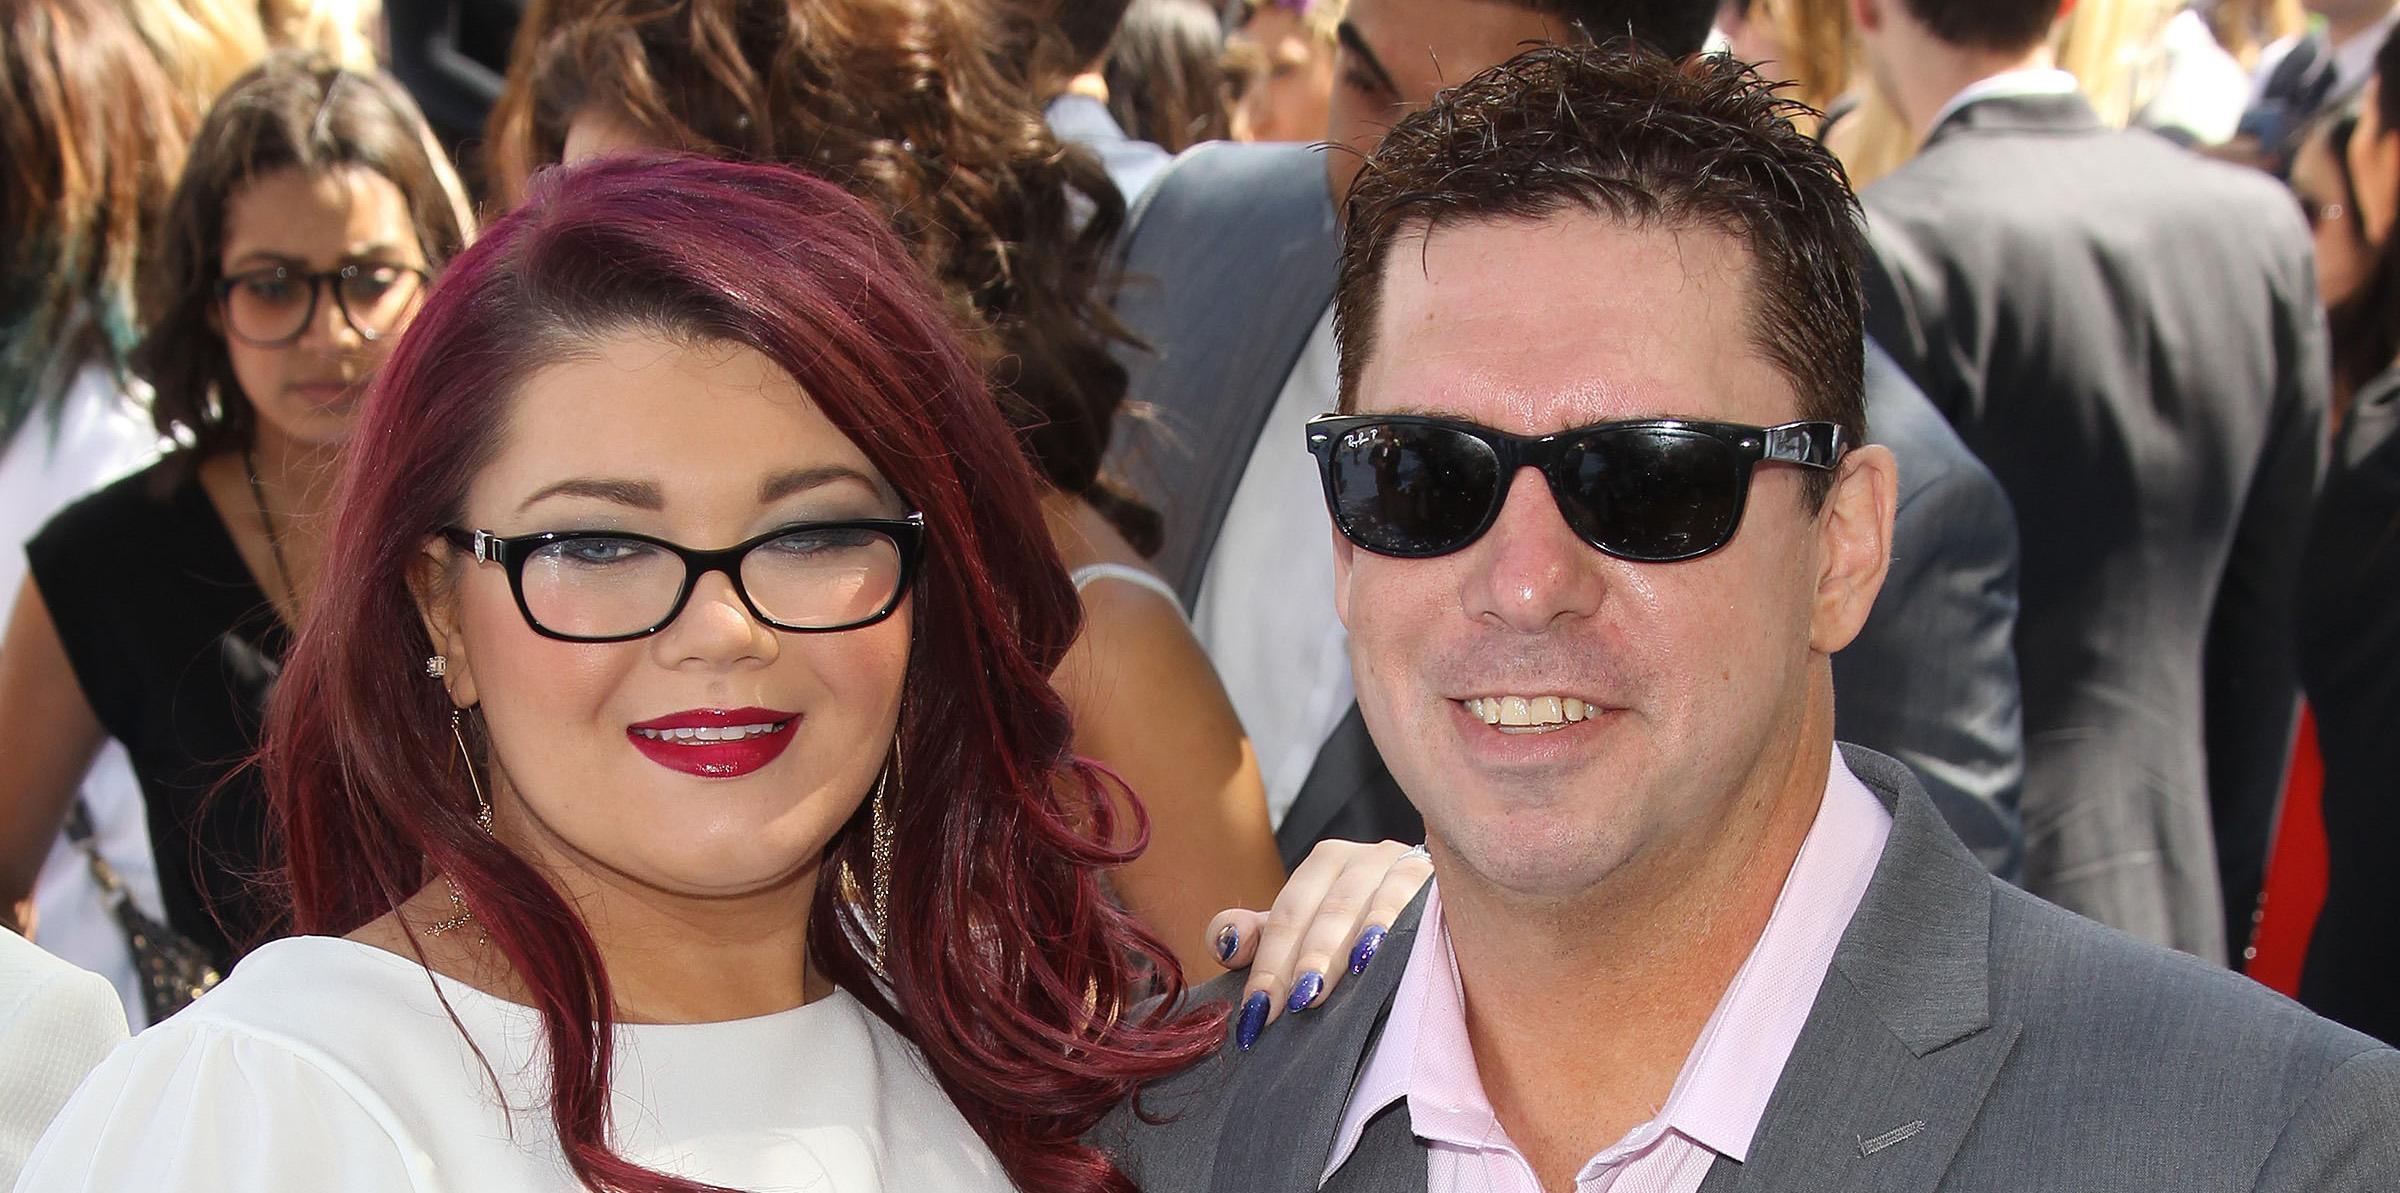 Teen Mom cast arrives at the 2015 MTV Movie Awards – Los Angeles